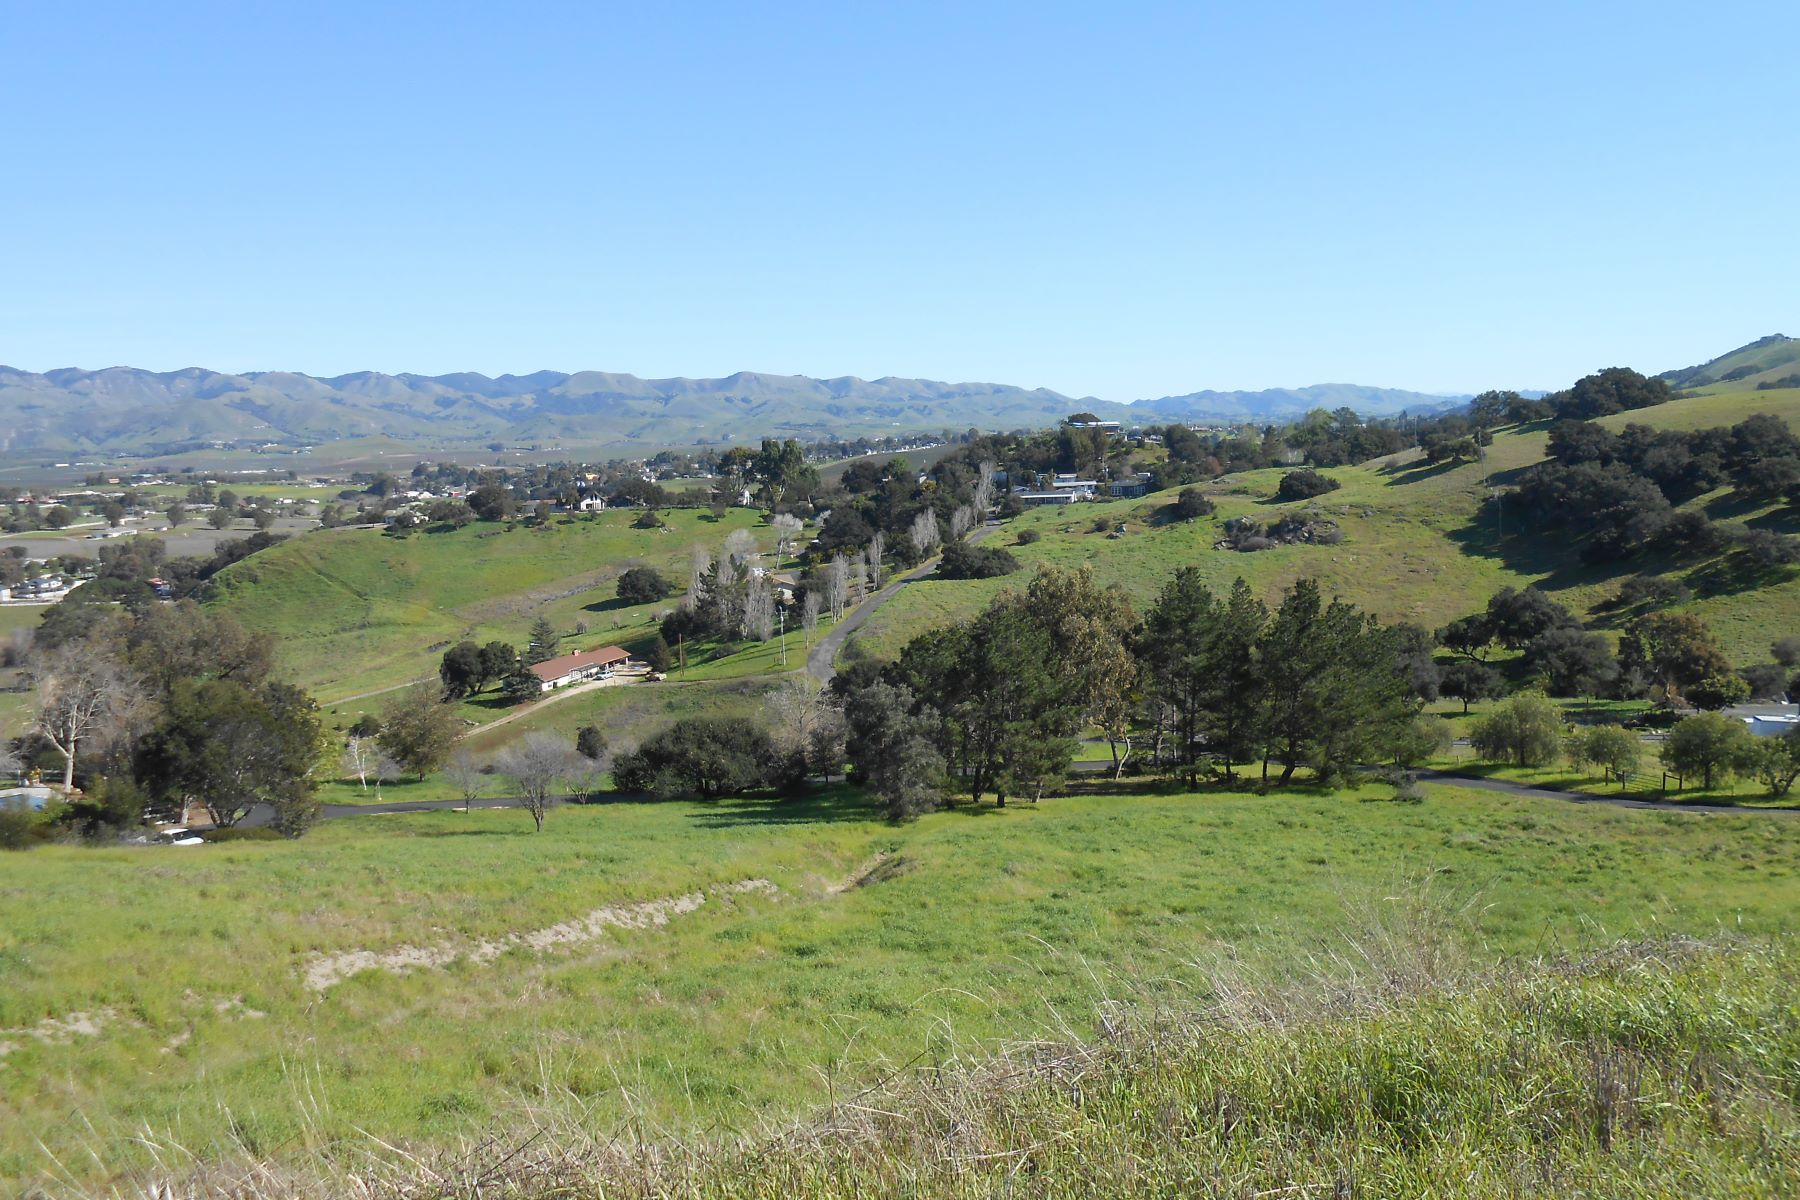 Land for Sale at Rancho Oaks Land 0 Rancho Oaks San Luis Obispo, California 93401 United States